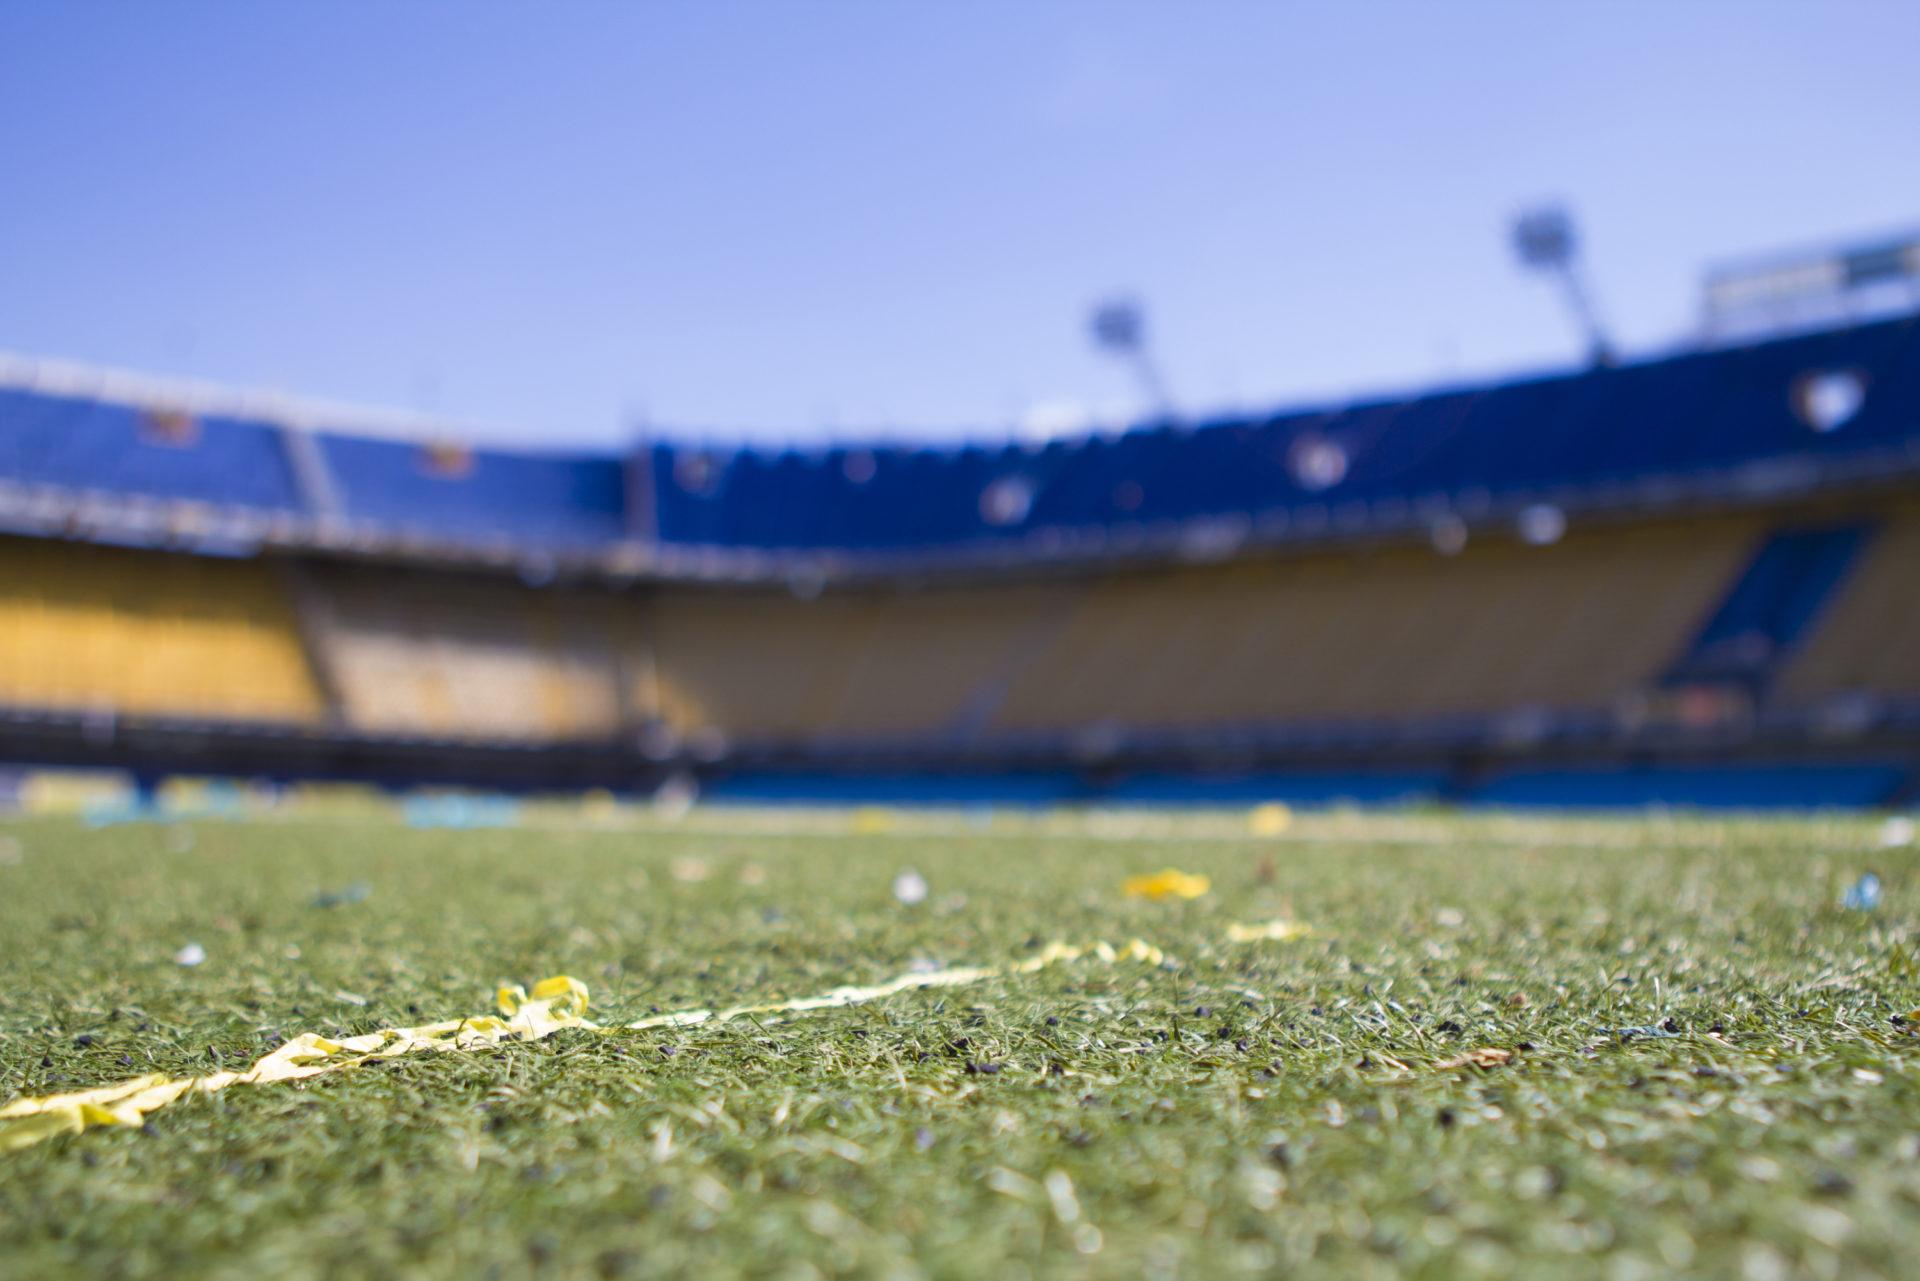 Mishandeling In Sport | Arbeid Advocaten - Amsterdam - Den Haag